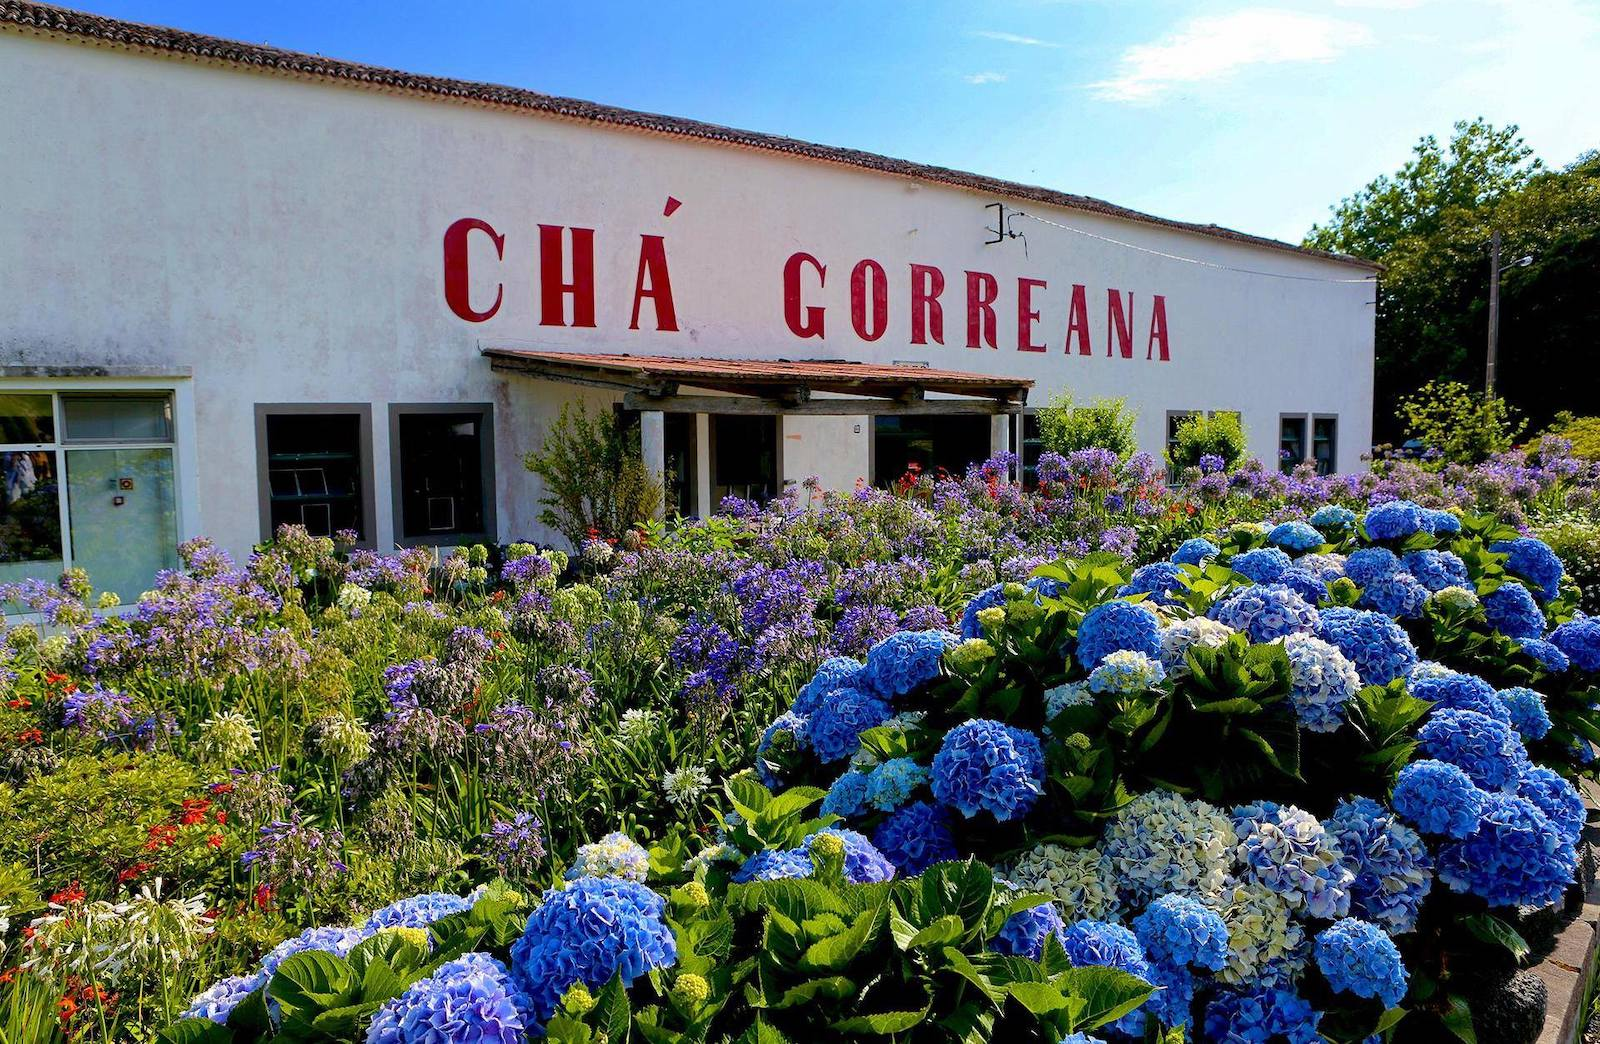 Gorreana Green Tea and its new companies: Pineapple, Hibiscus, Lúcia Lima, Aníse, Lemon Grass, Pennyroyal, Parsley and Mint + Lemon.